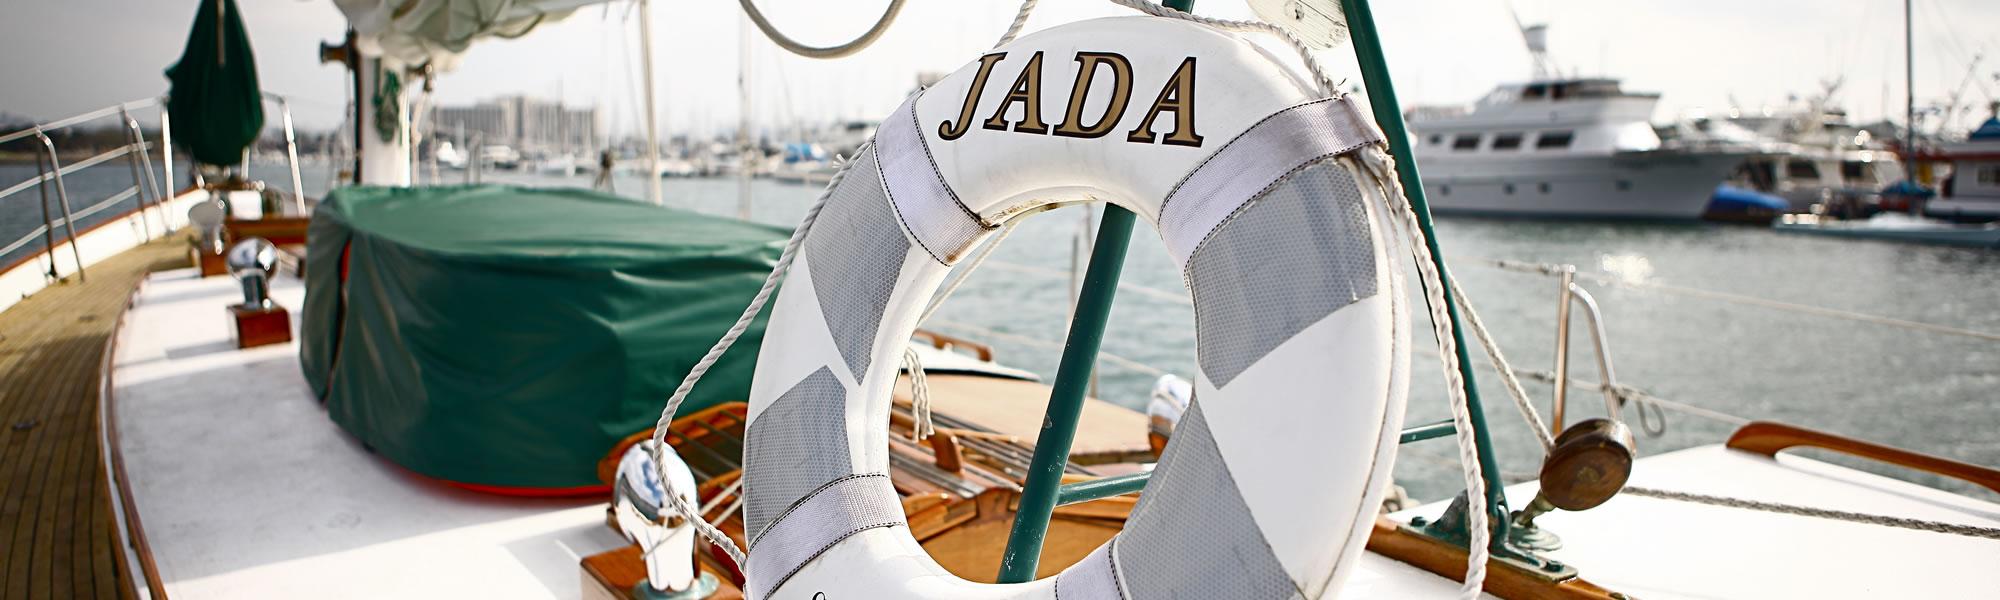 sail_jada